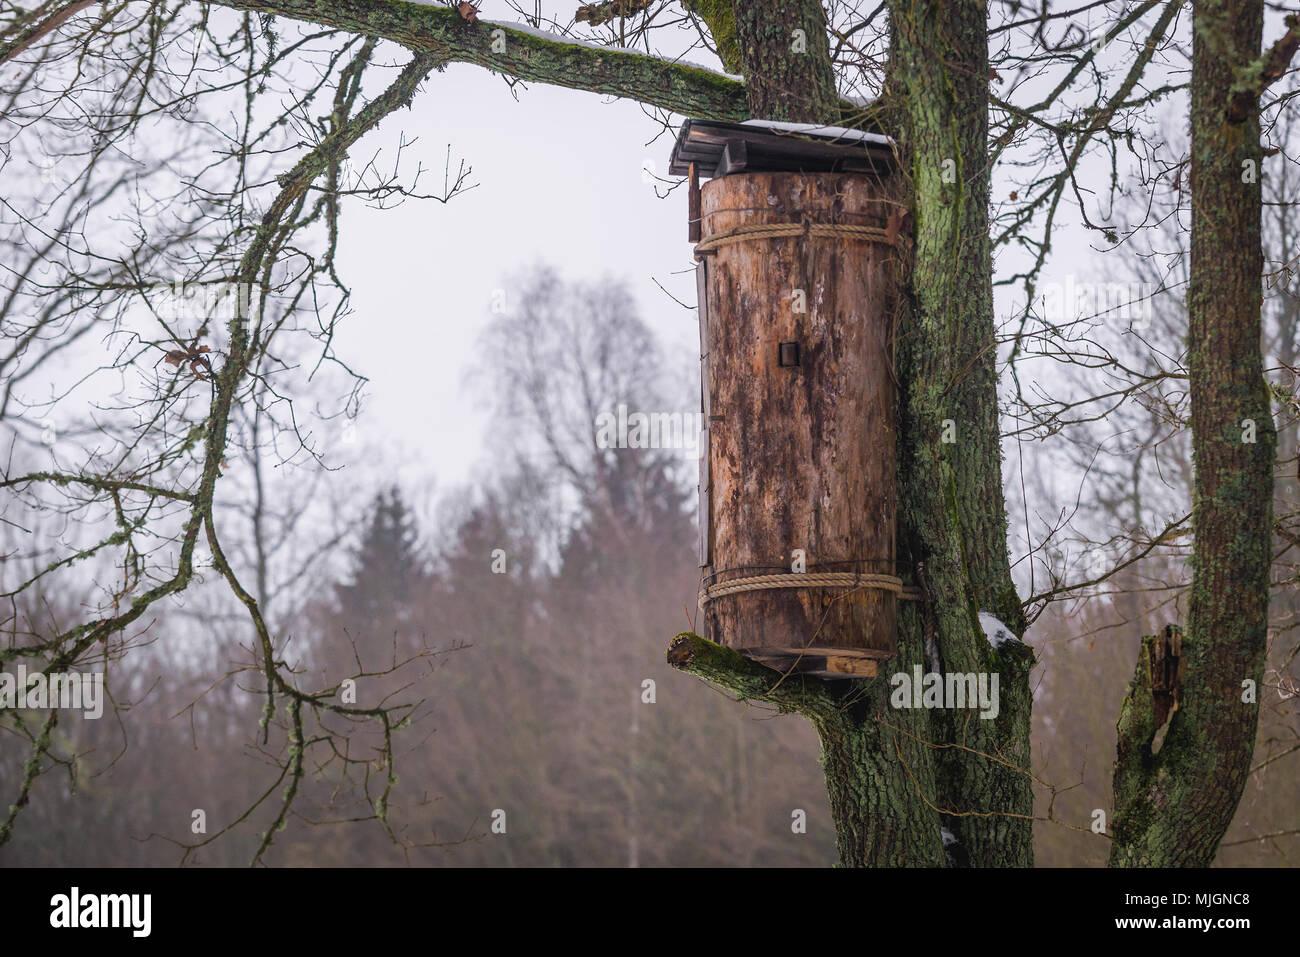 Traditional tree beehive called barc in Gruszki village within Hajnowka County, Podlaskie Voivodeship of Poland - Stock Image